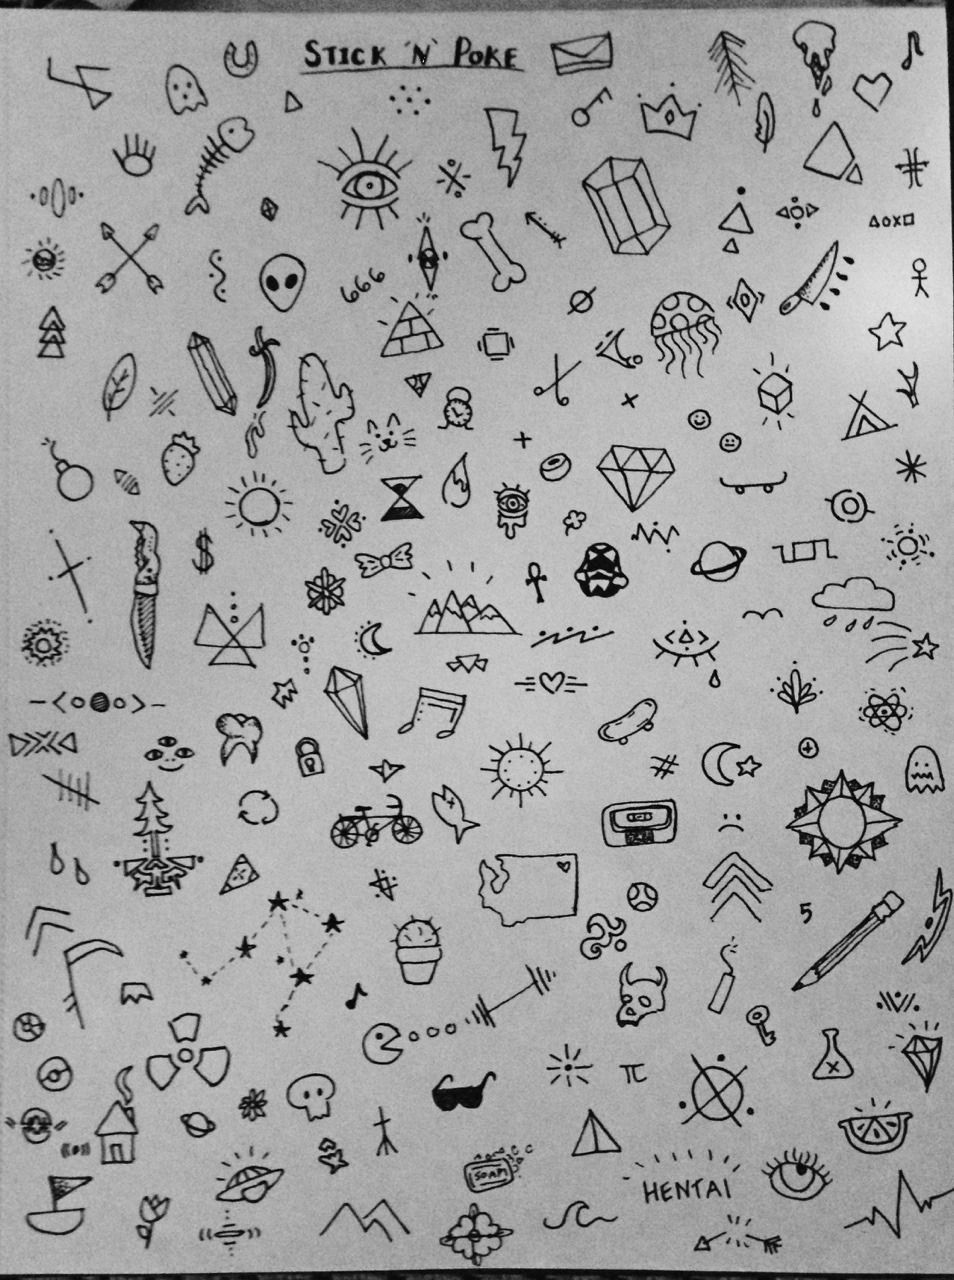 Some Stick And Poke Ideas I Drew Up татуэскизыпартаки идеи для